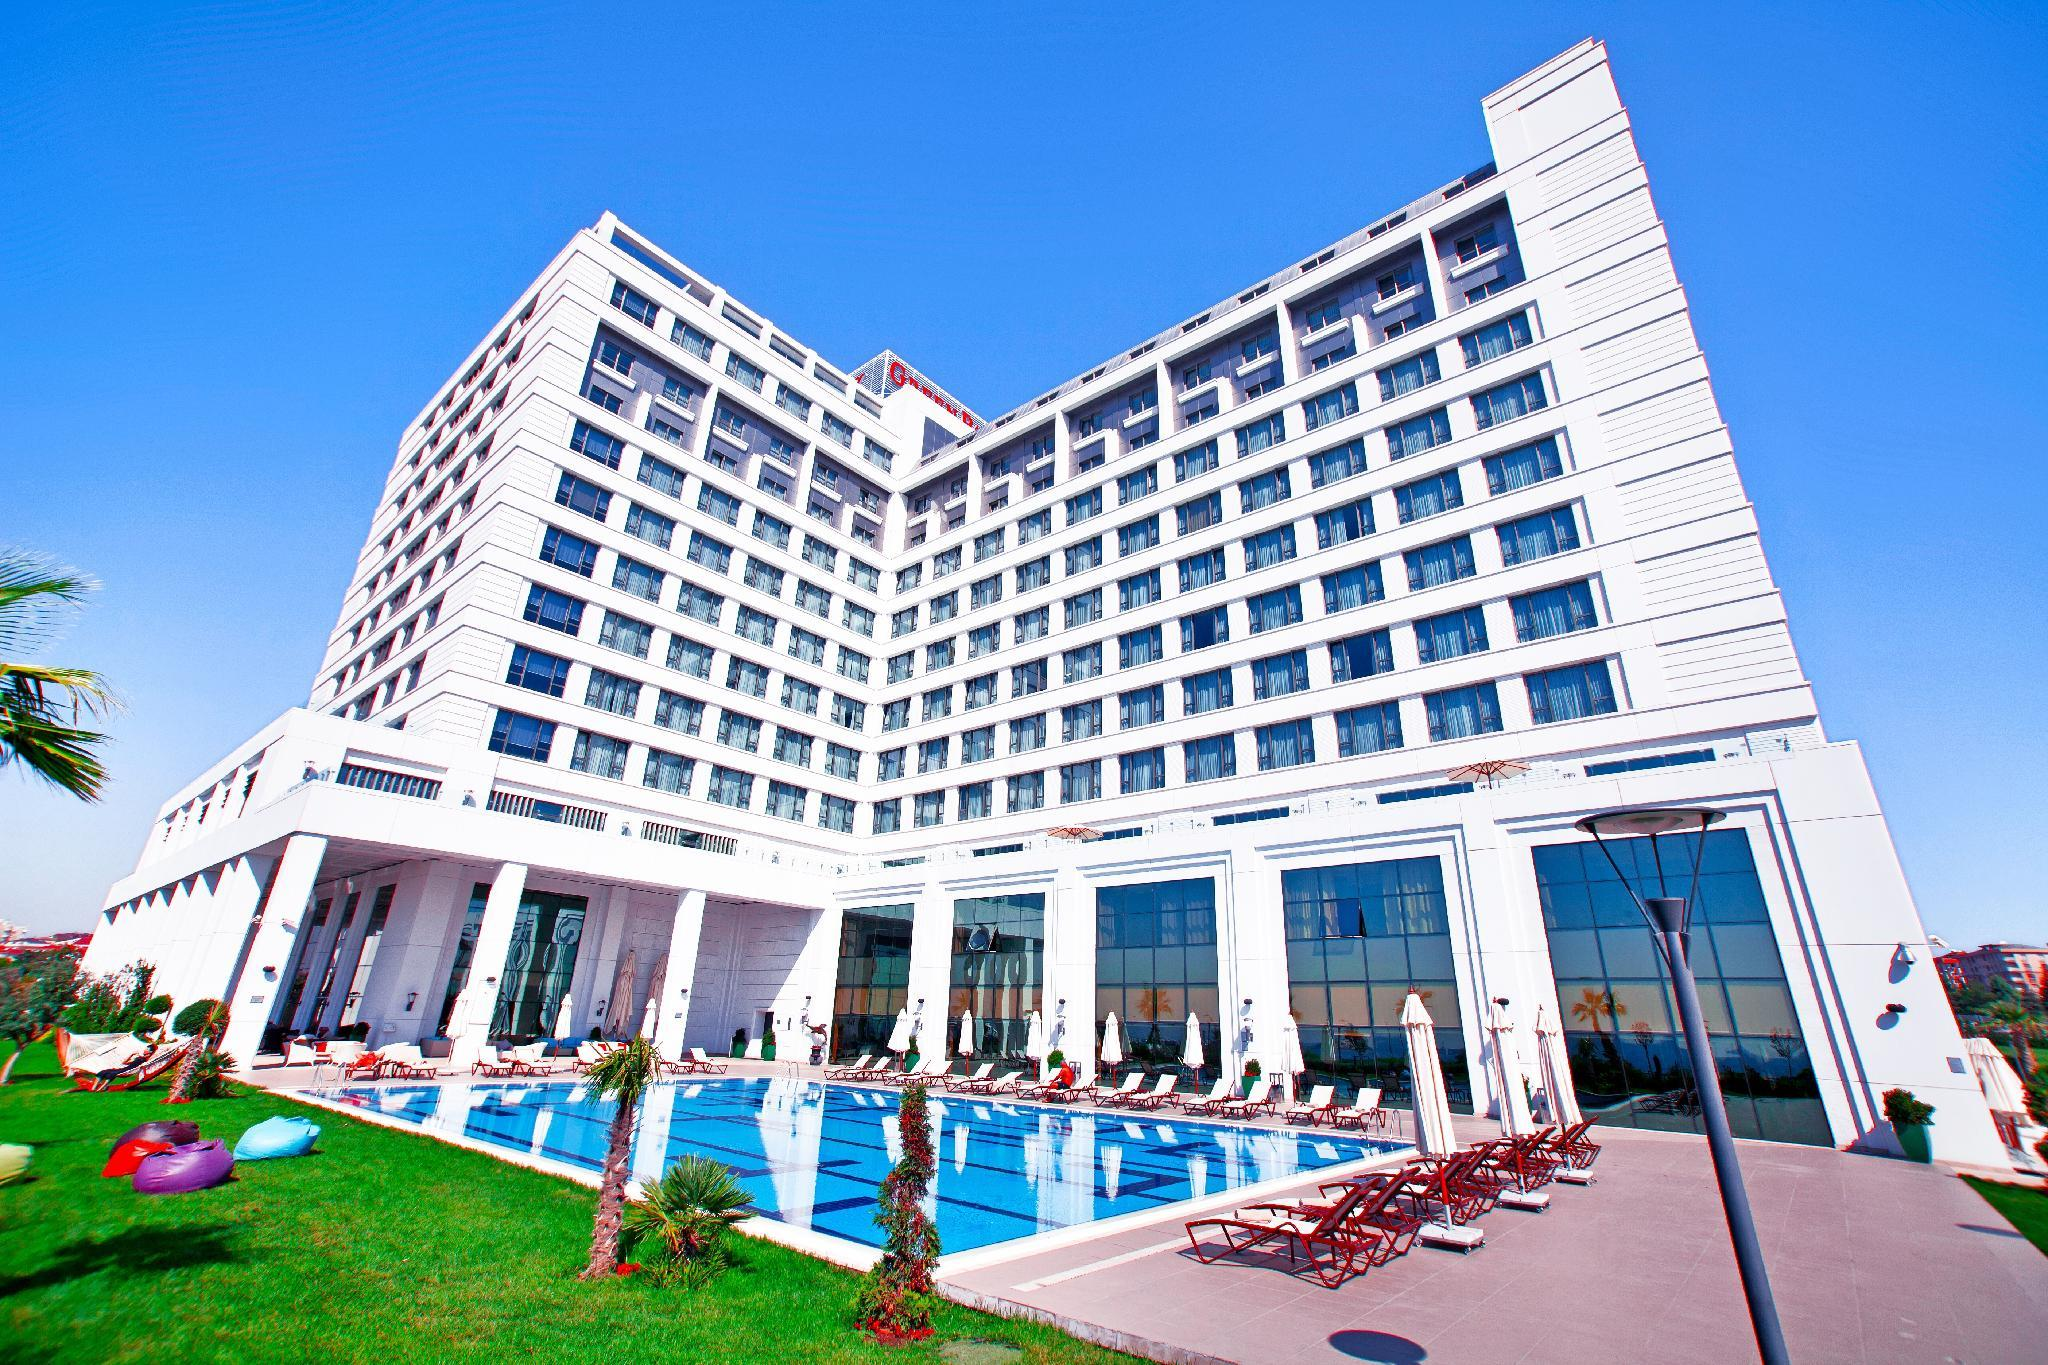 The Green Park Pendik Hotel & Convention Center 2